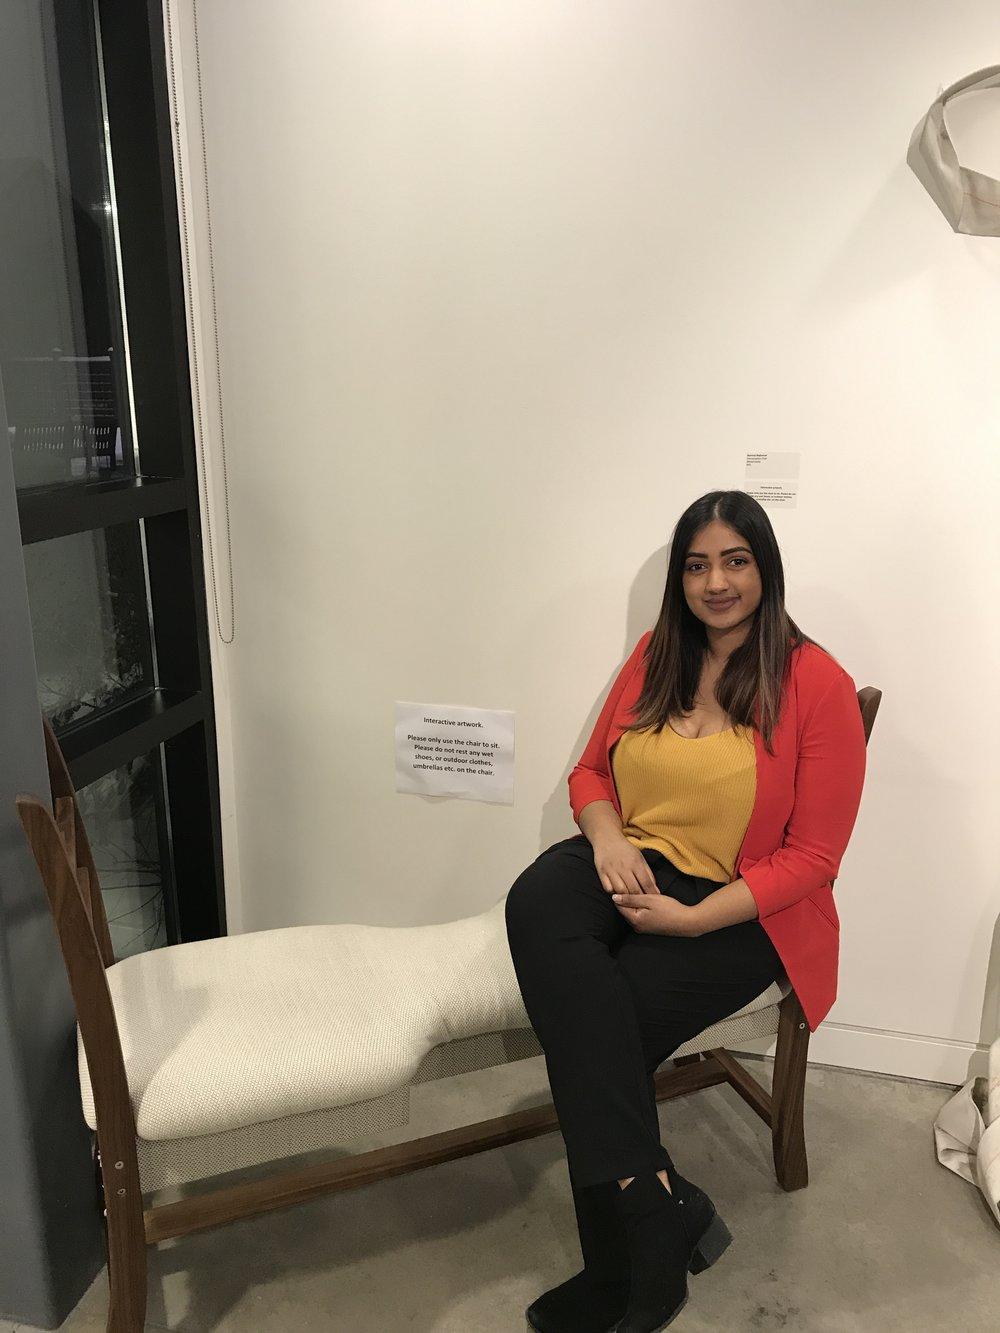 Semone Rajkumar's Conversation Chair. A custom-built bench made to facilitate conversation.